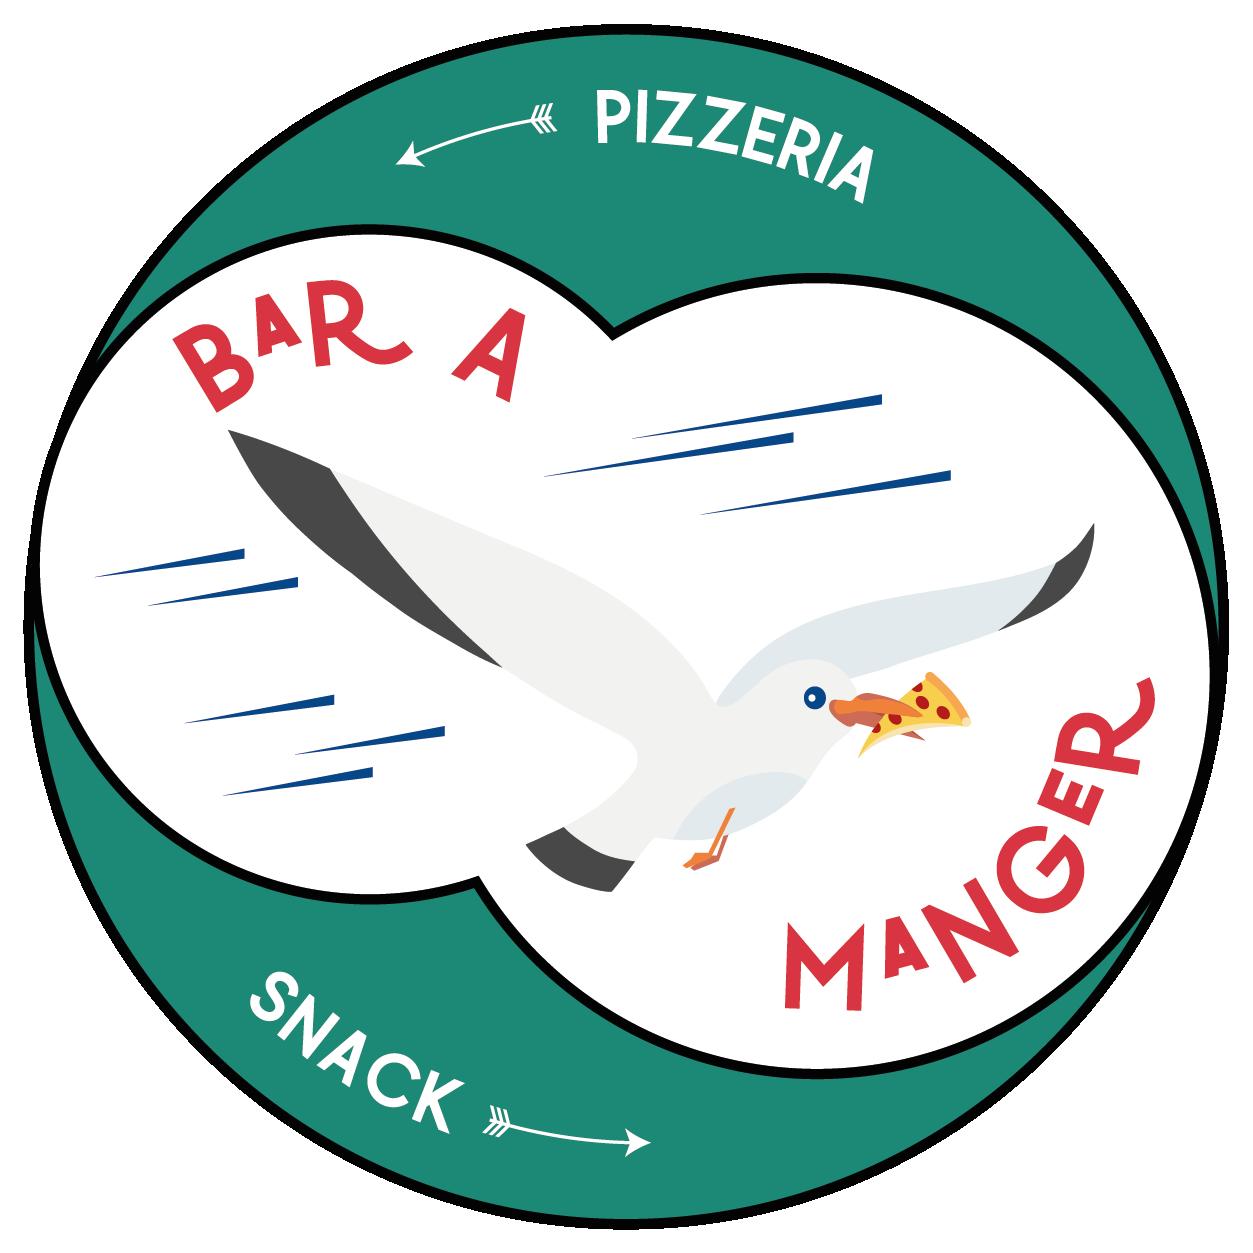 Pizeeria Bar à Manger